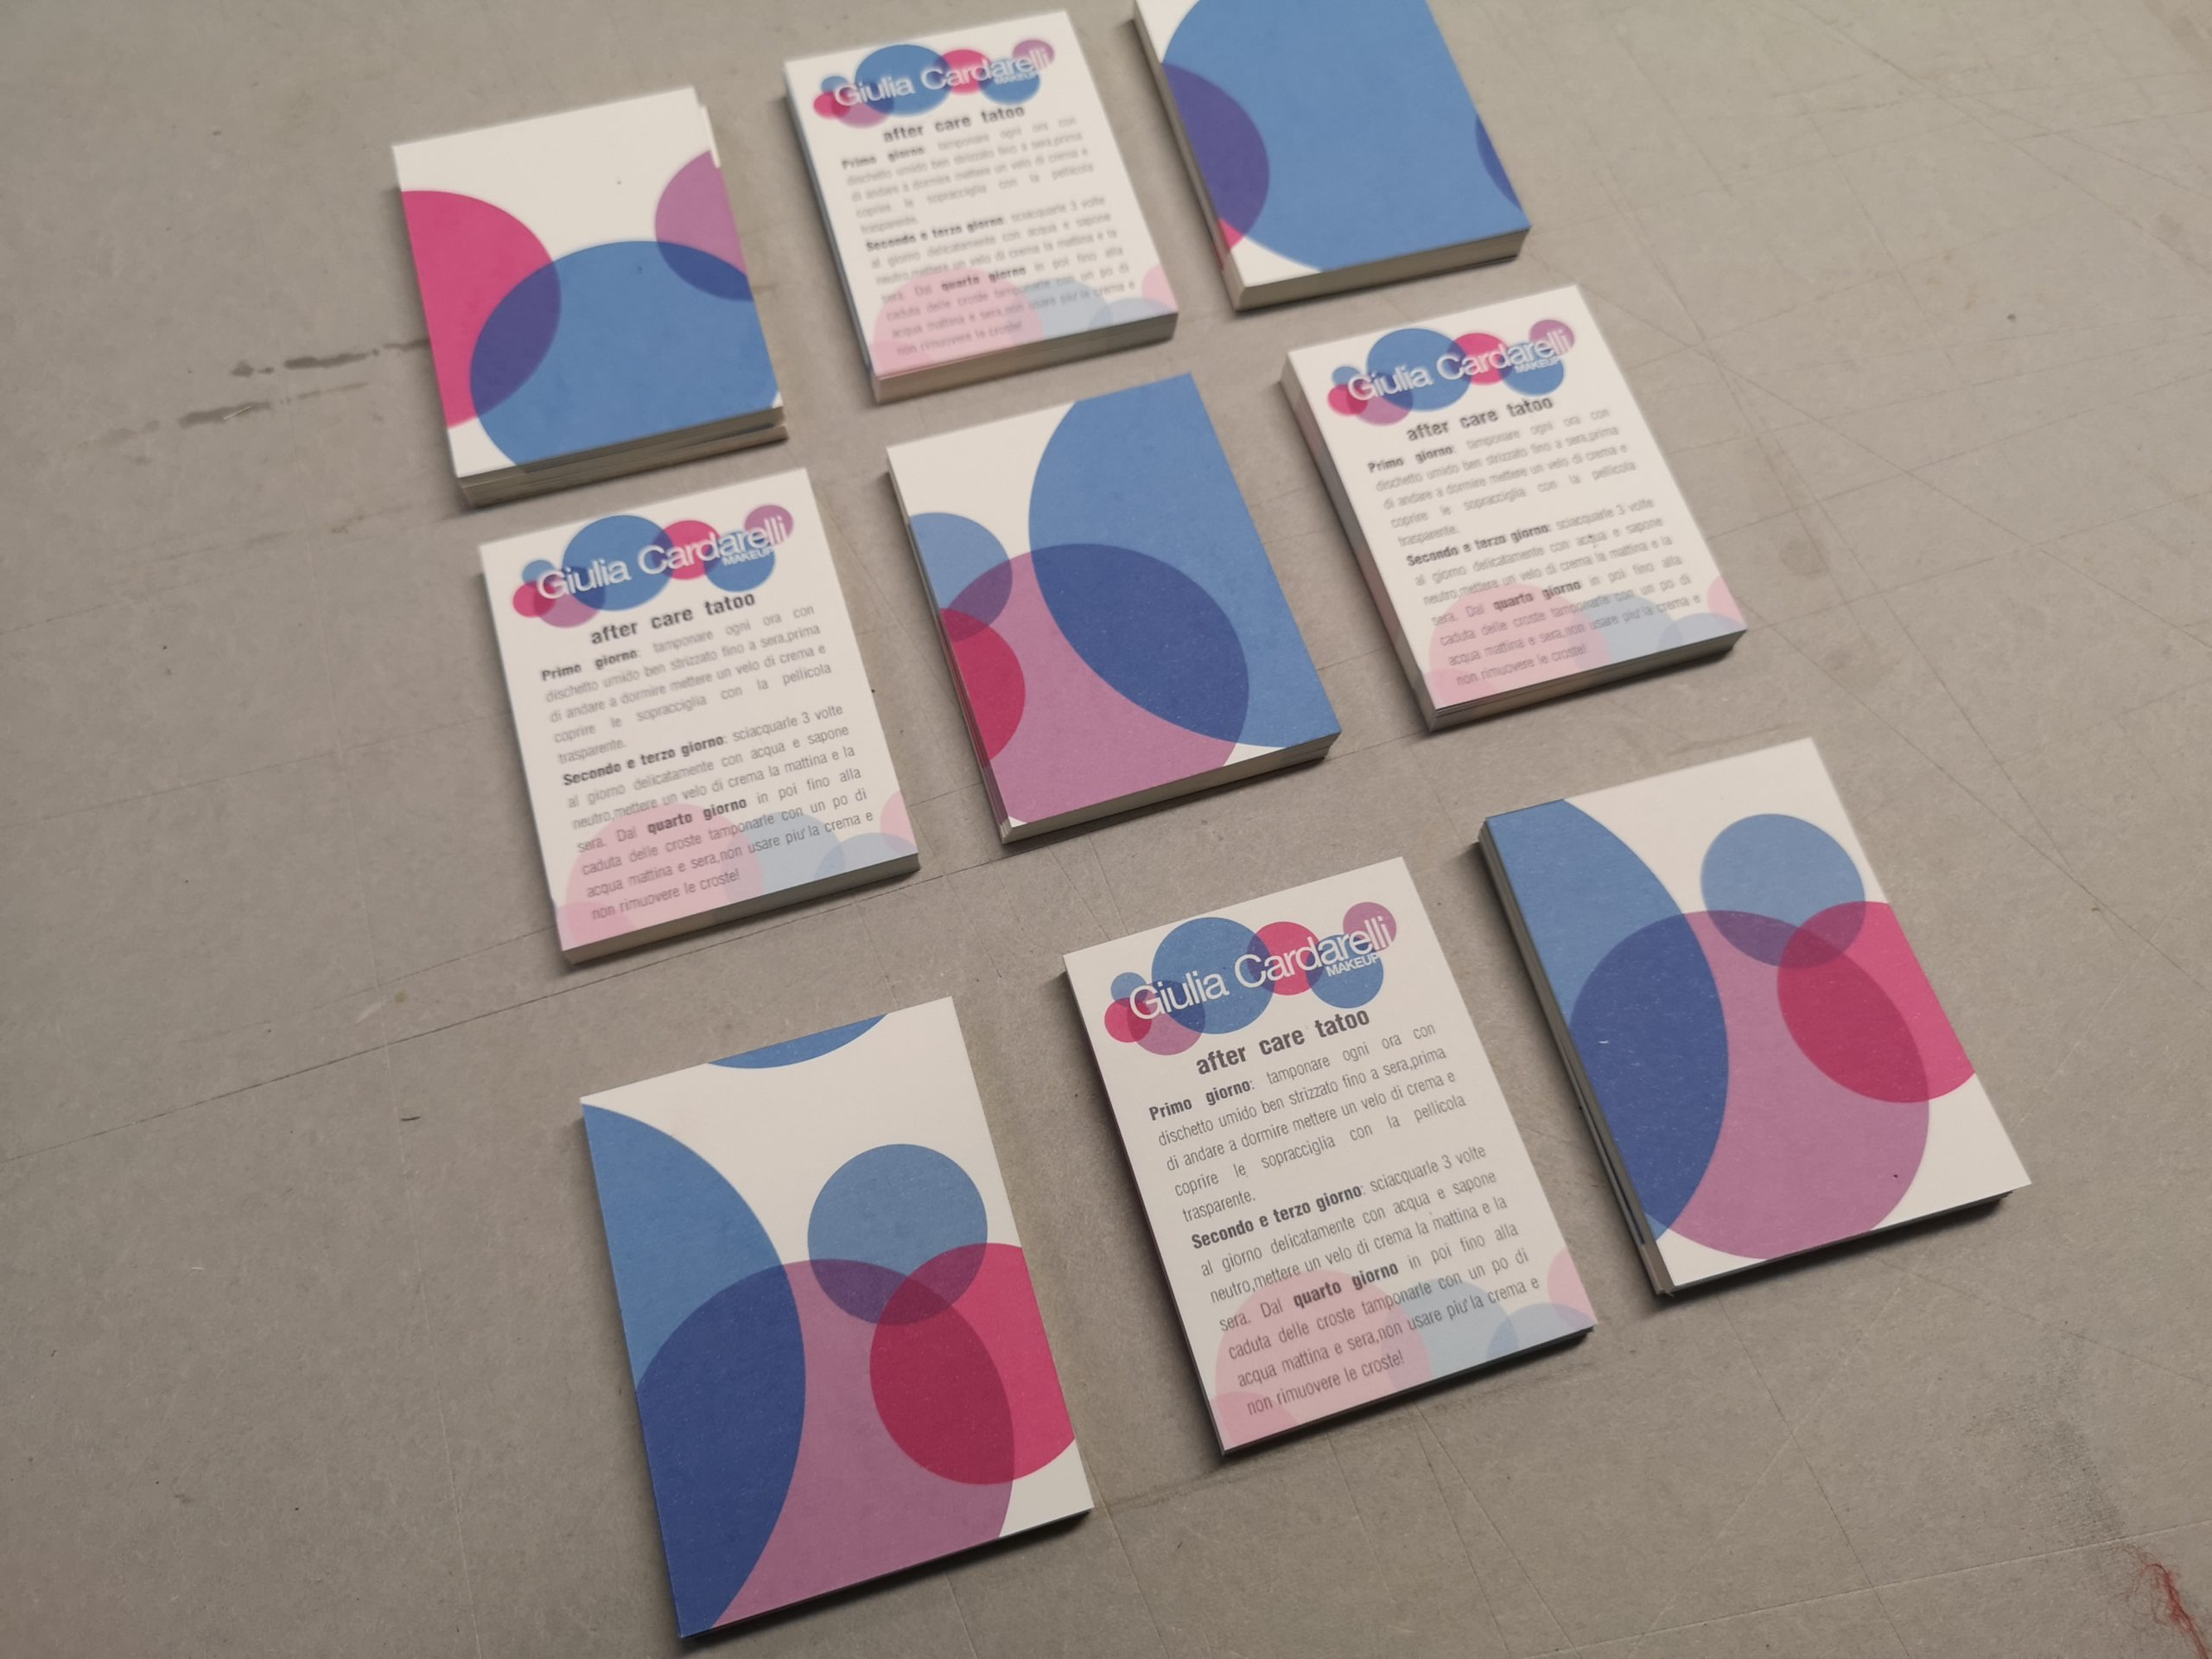 Giulia Cardarelli Make Up artist business cards | MASTROiNCHIOSTR